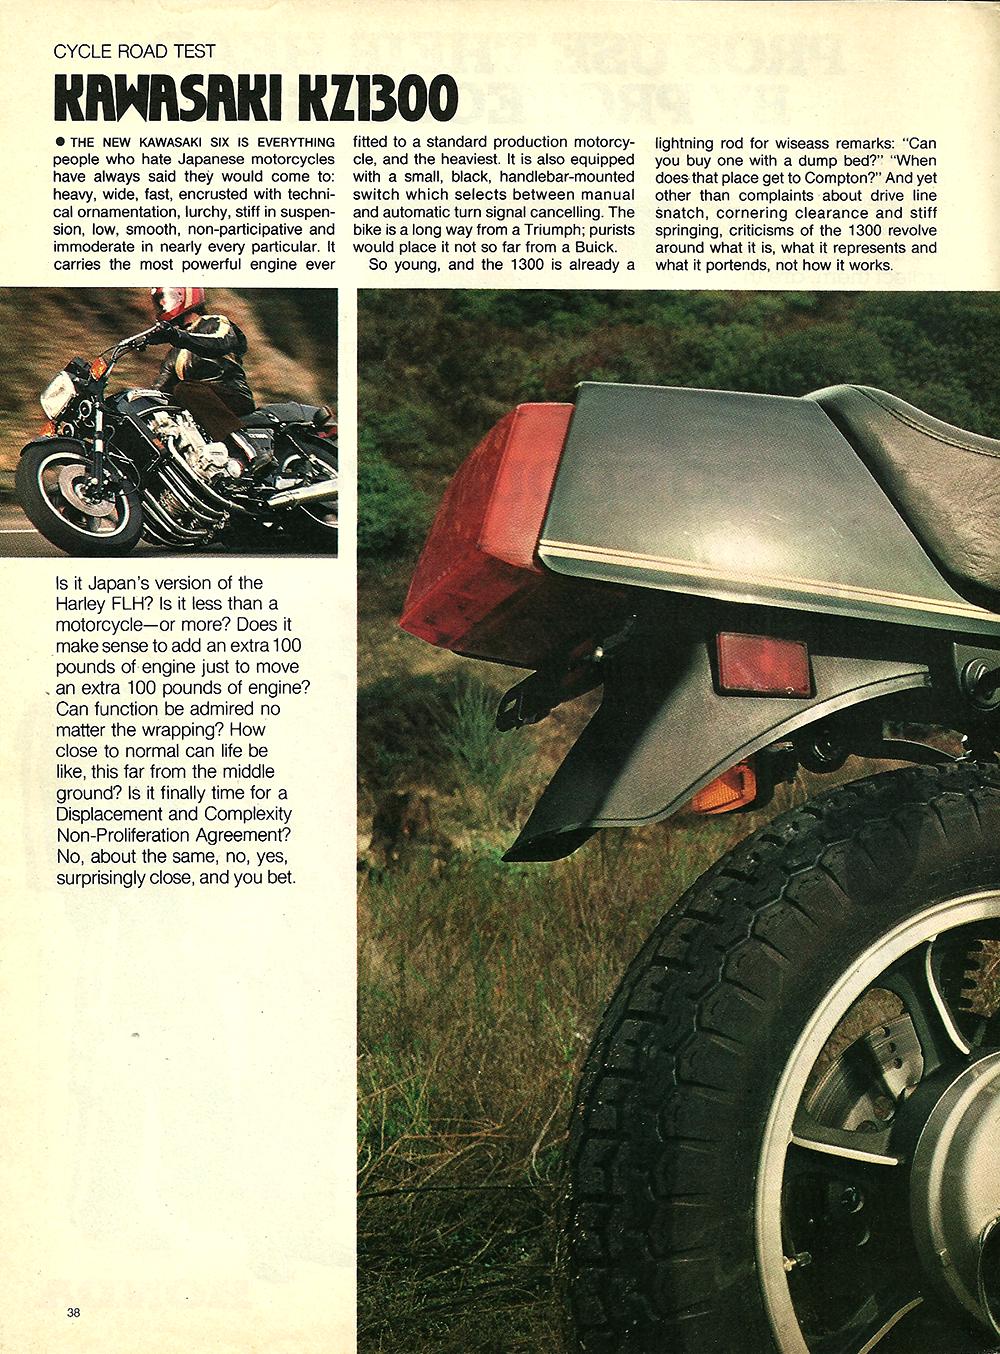 1979_Kawasaki_KZ1300_test_pg1.png